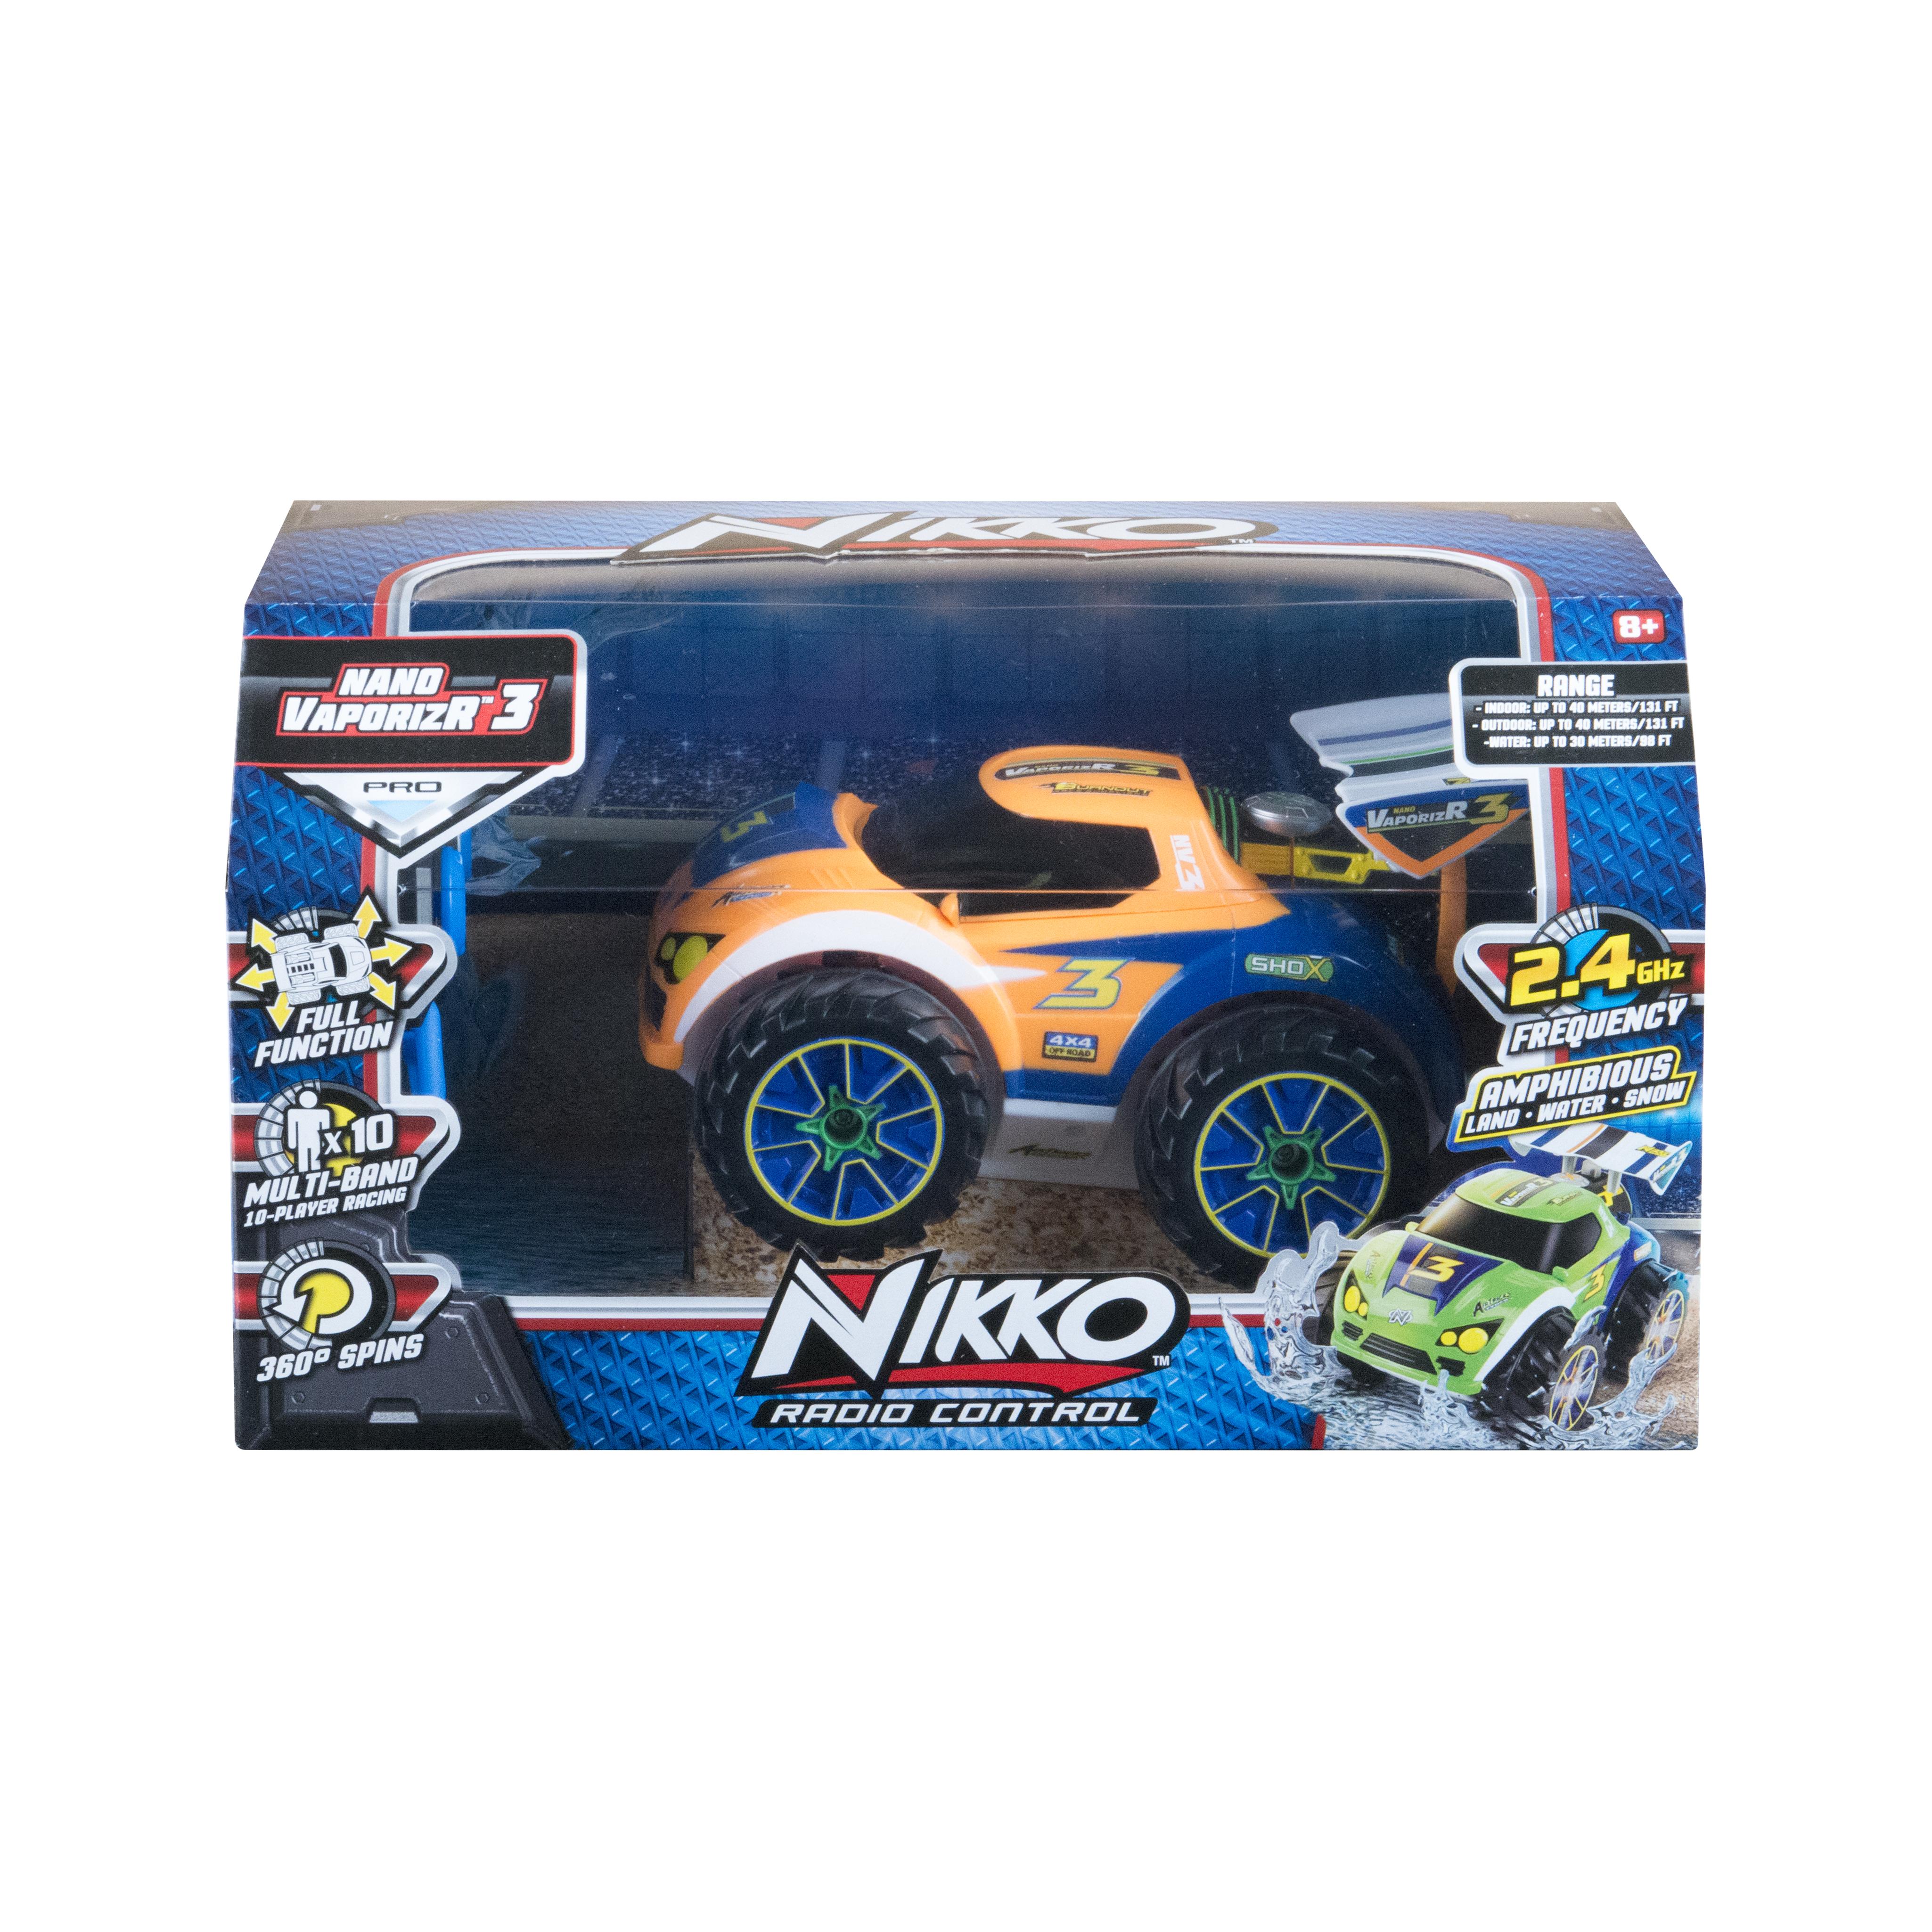 NIKKO Nano VaporizR 3